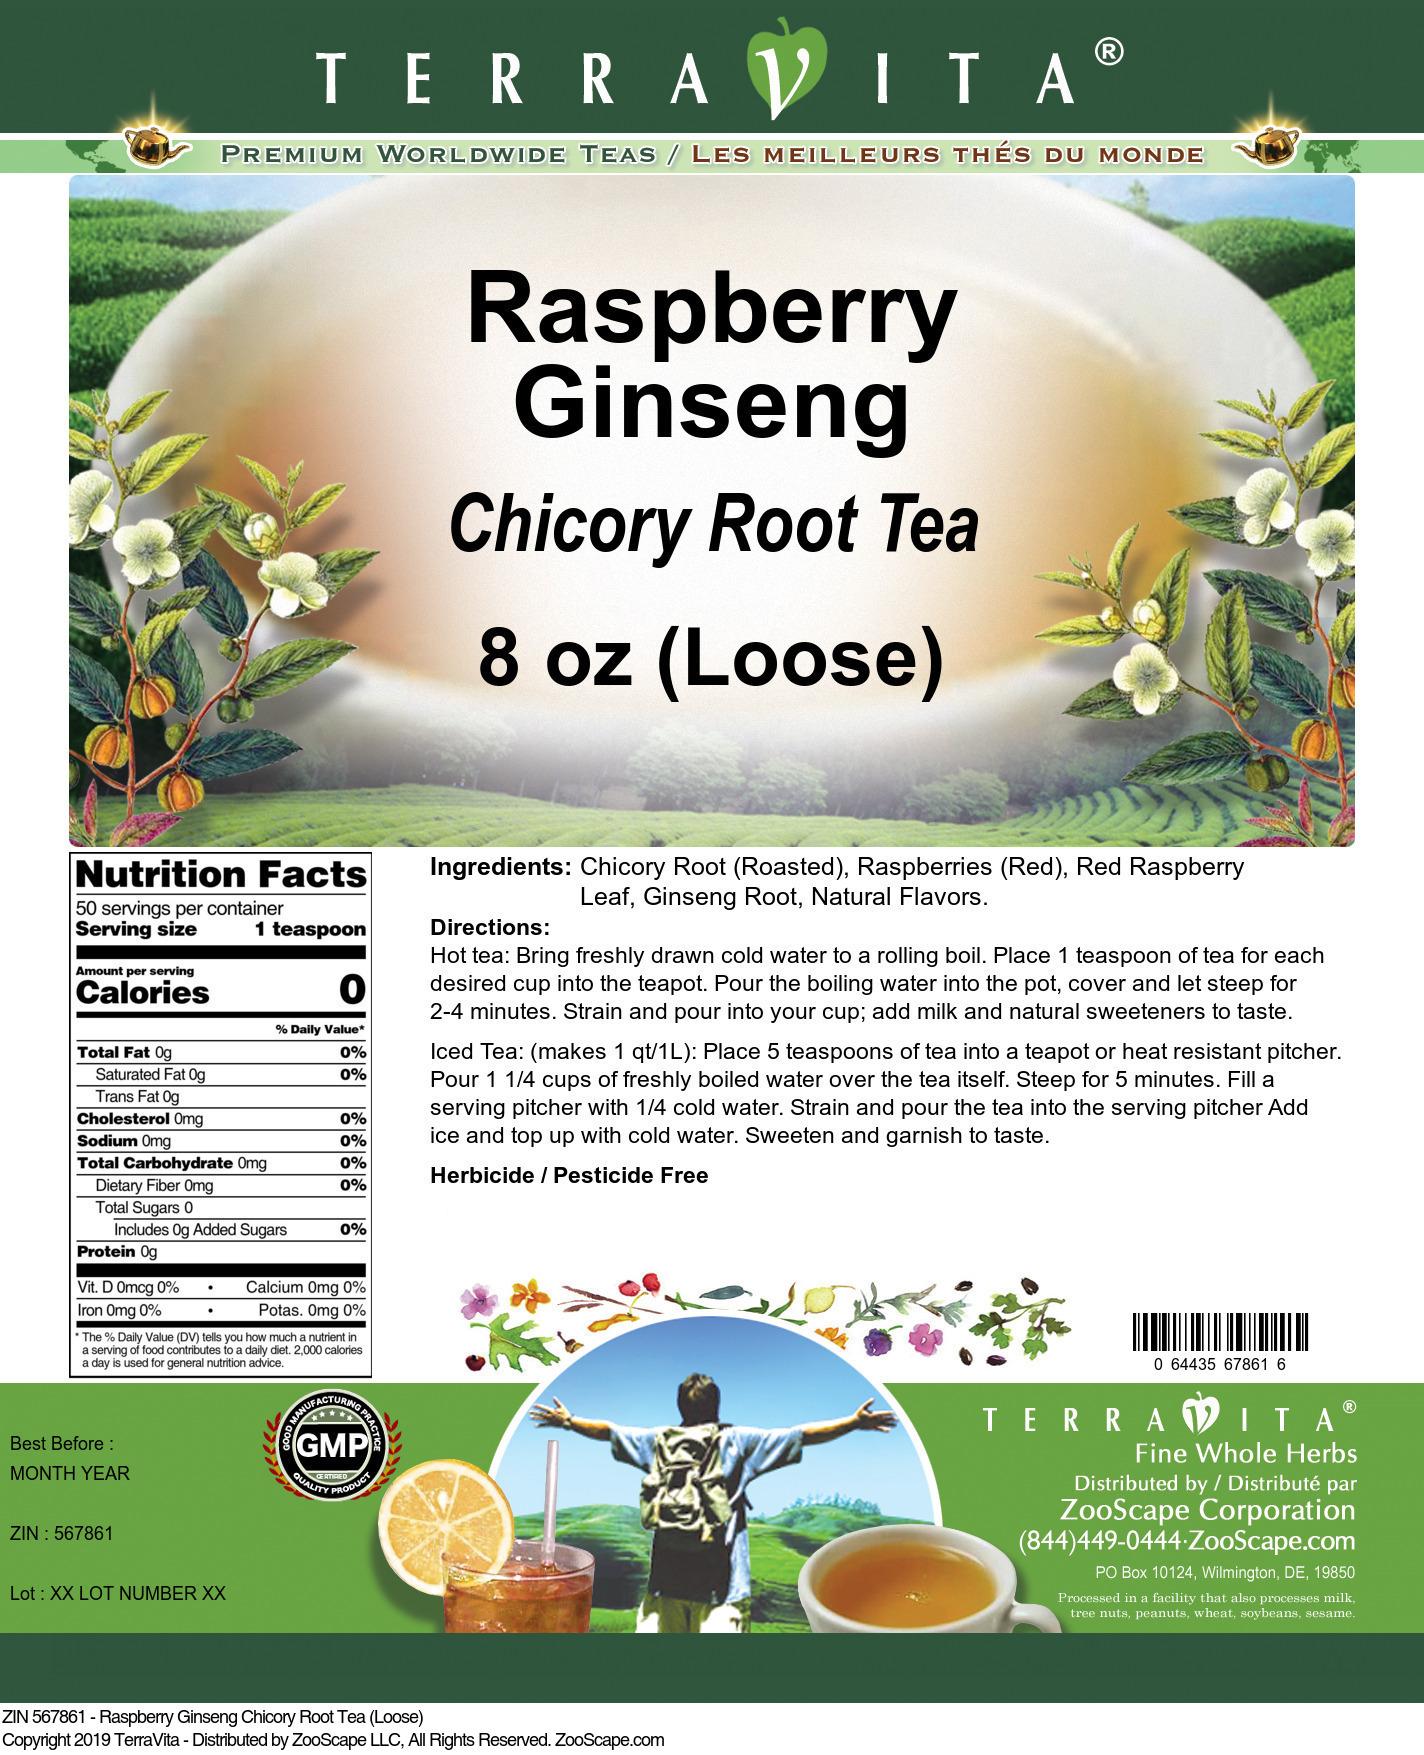 Raspberry Ginseng Chicory Root